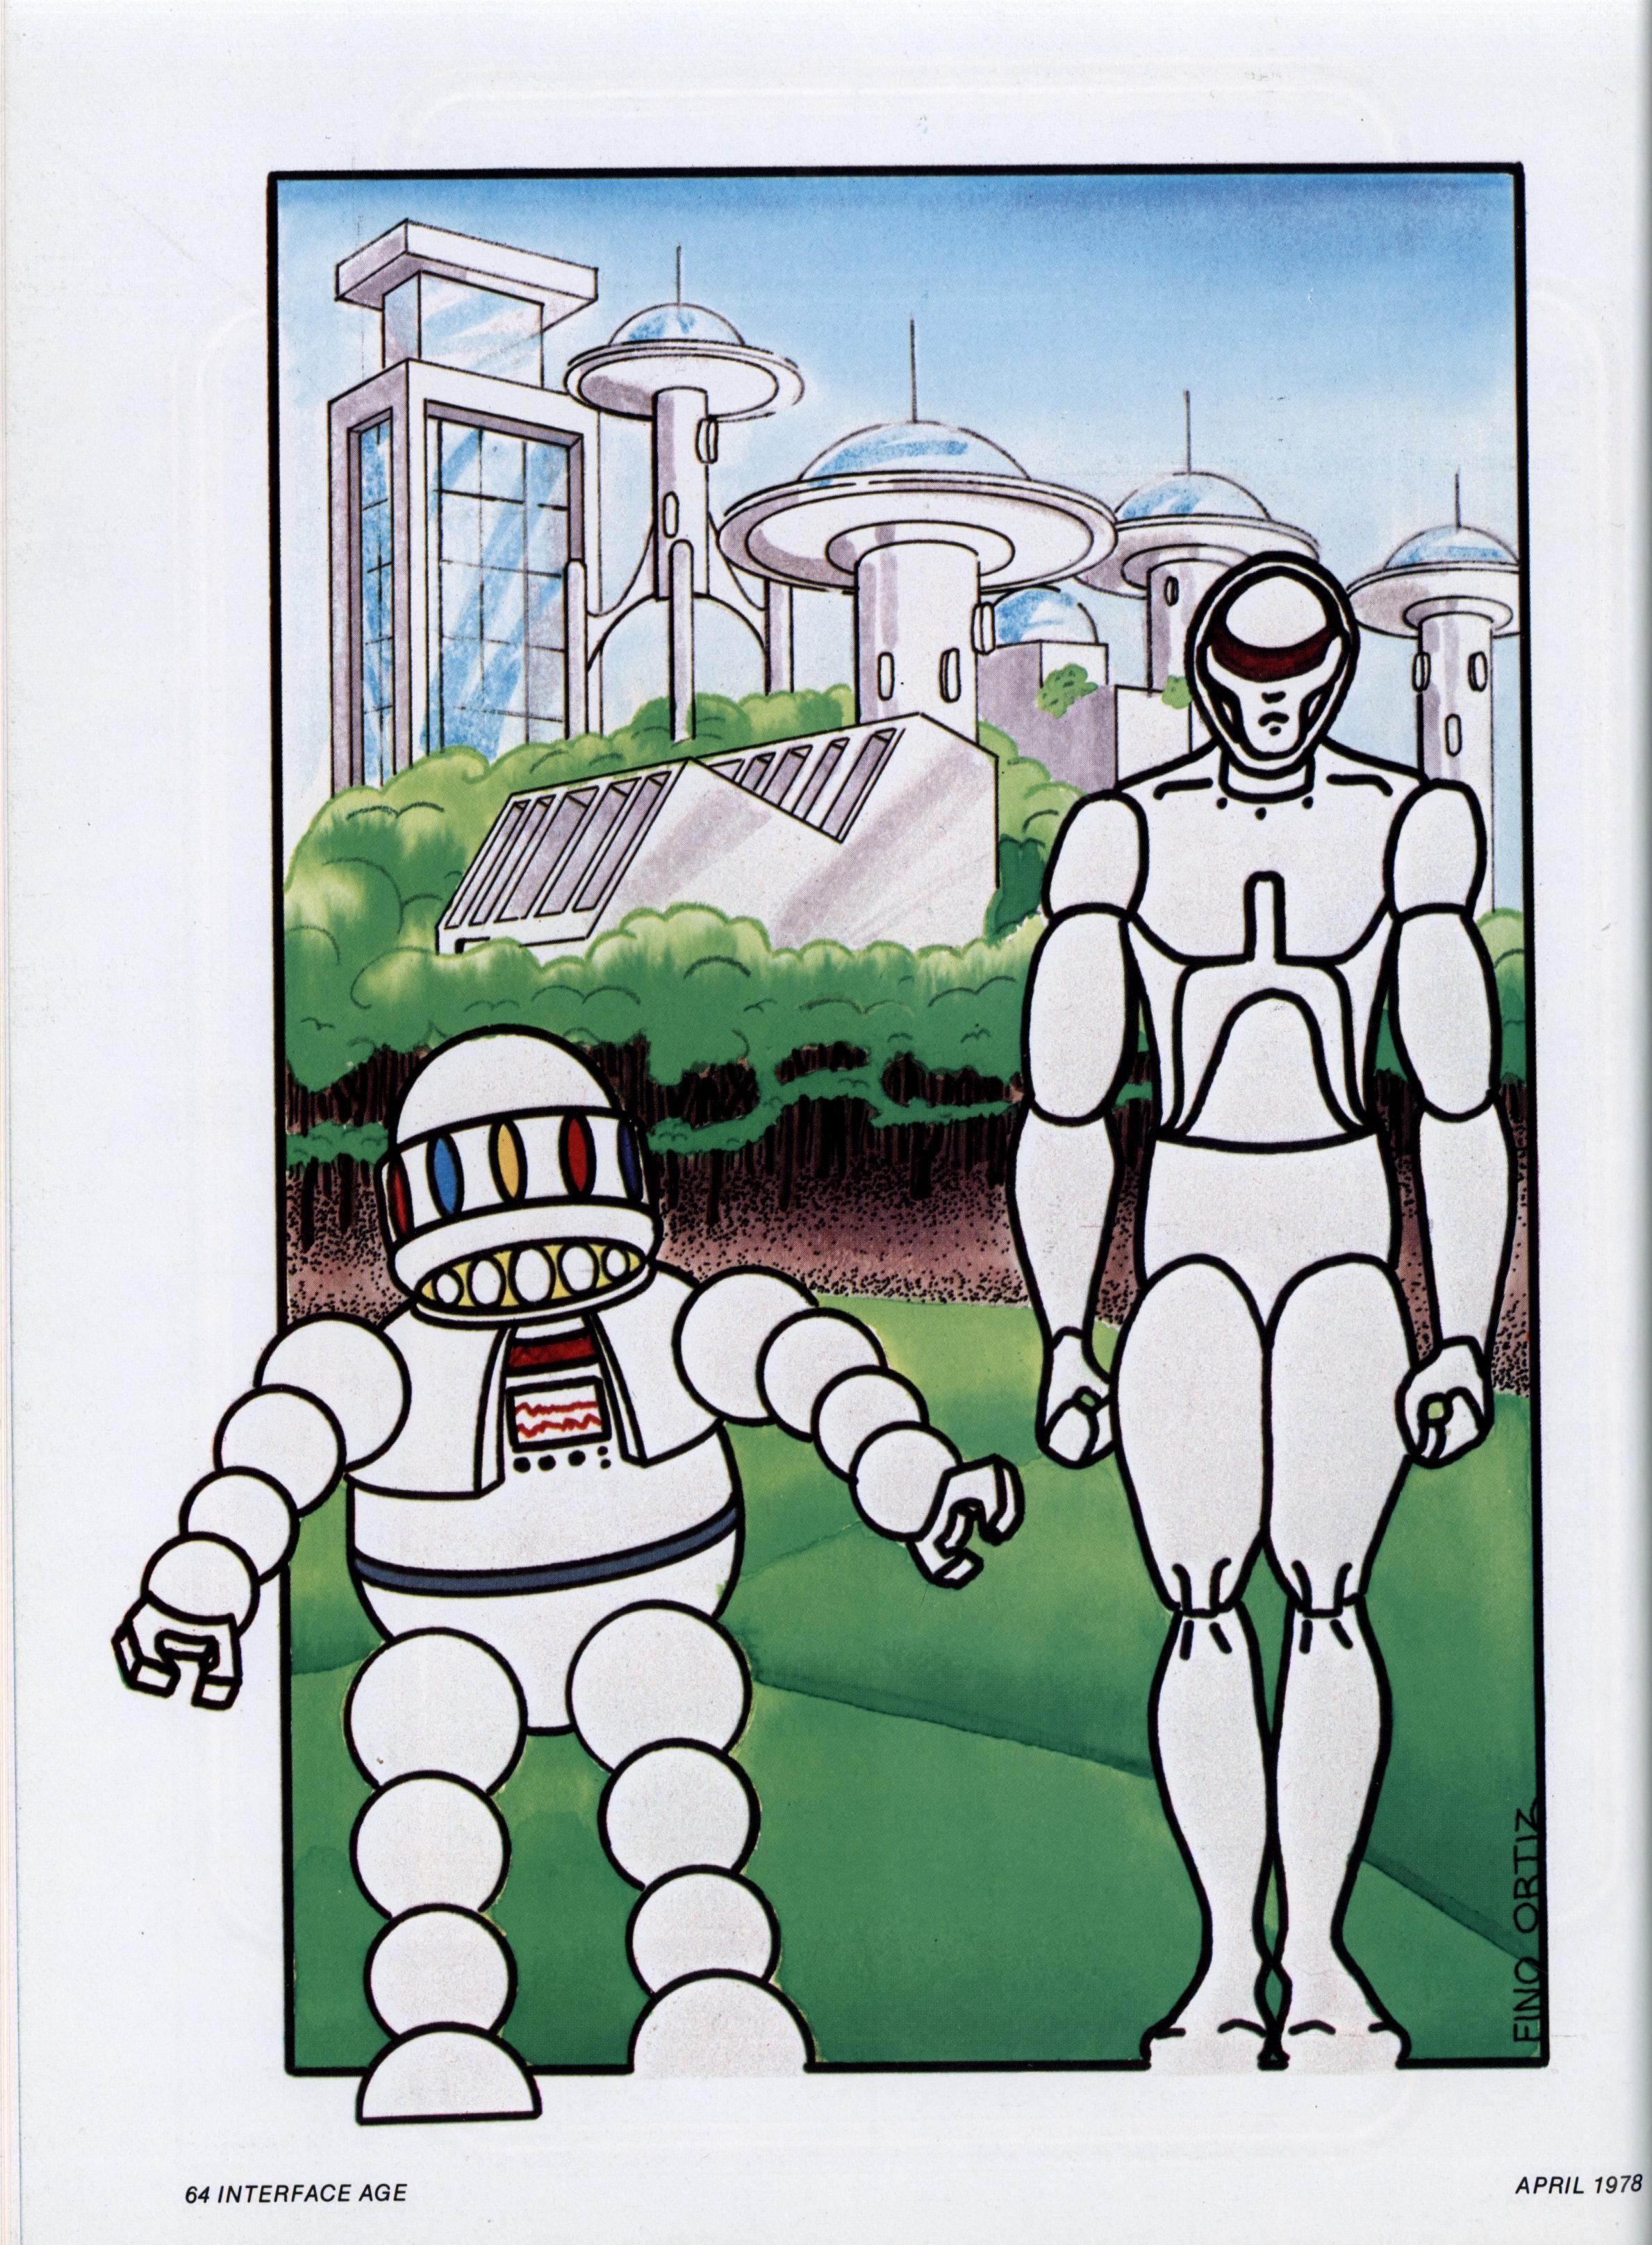 A brief history of robots